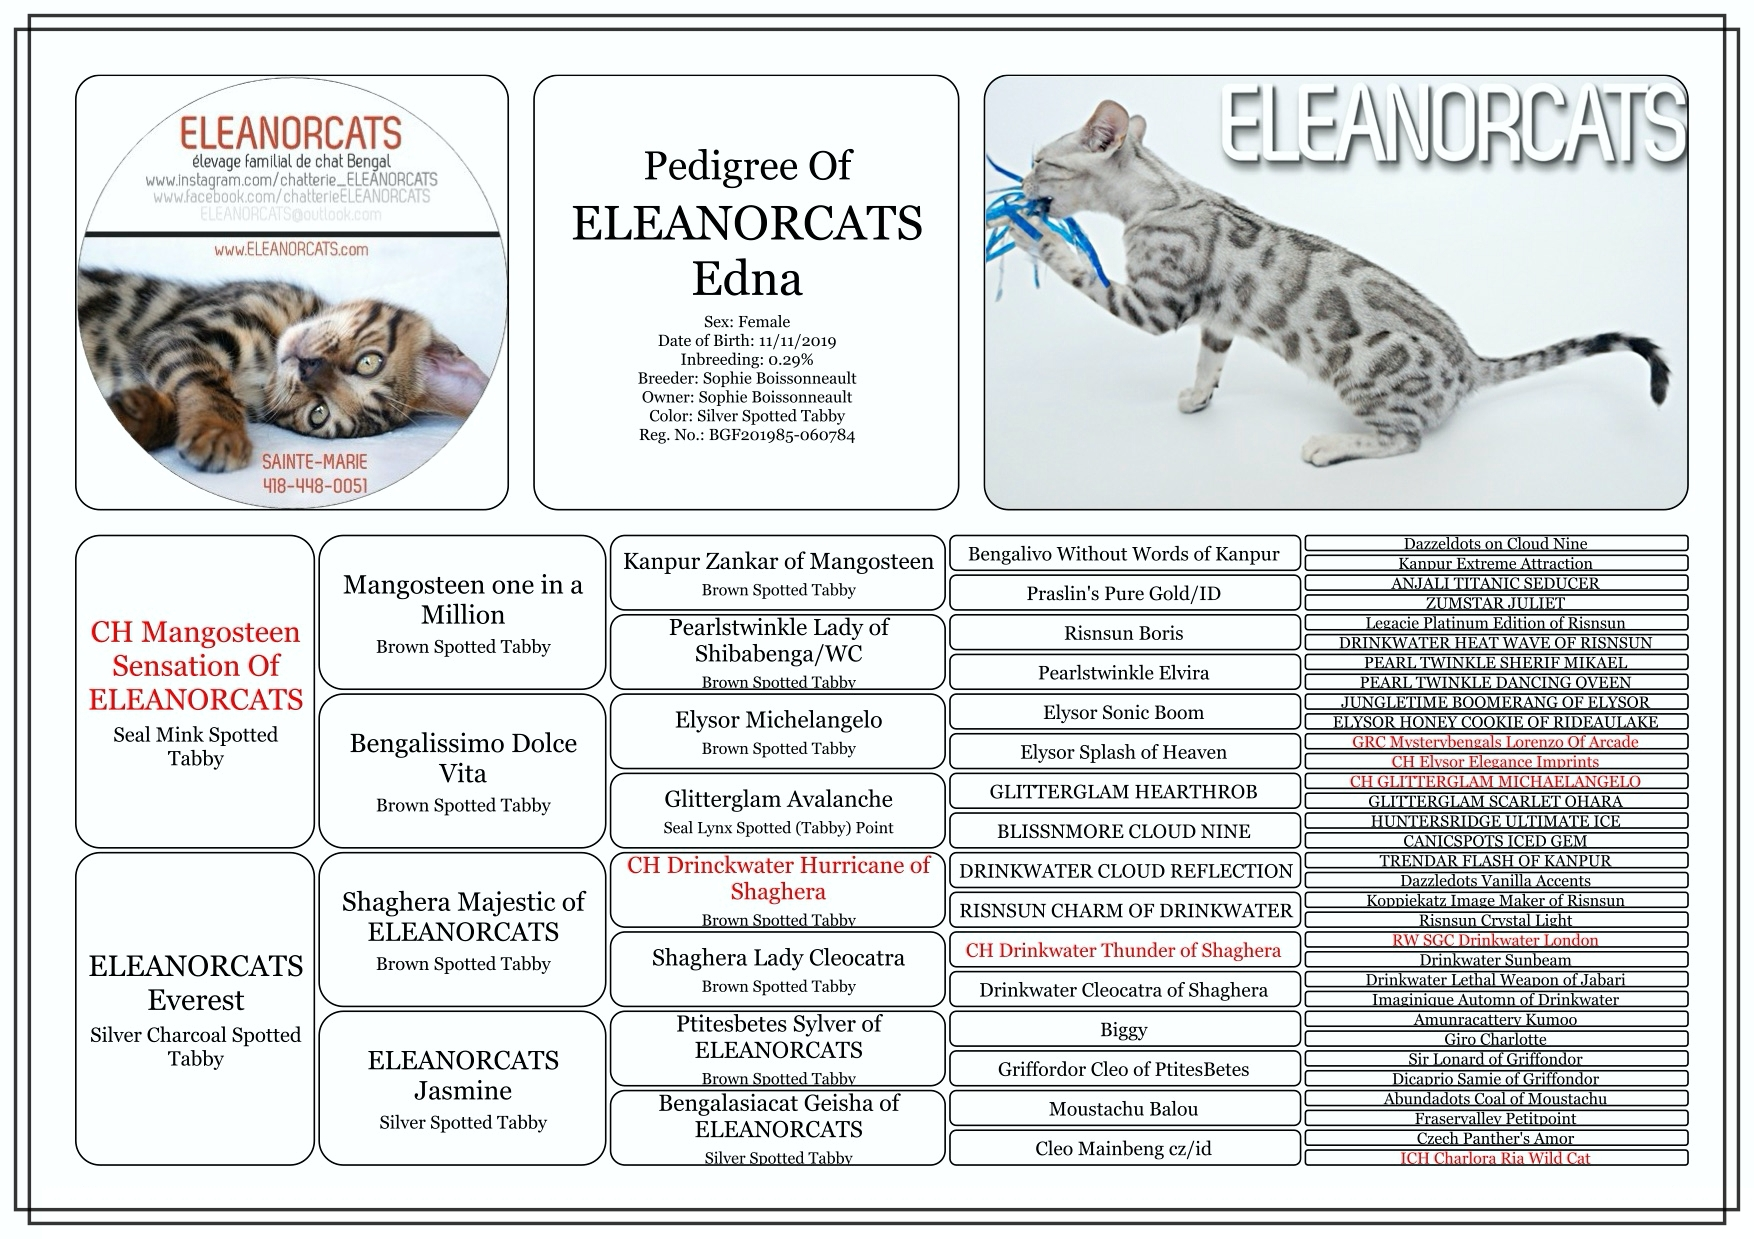 Edna - Pedigree bengal cat silver